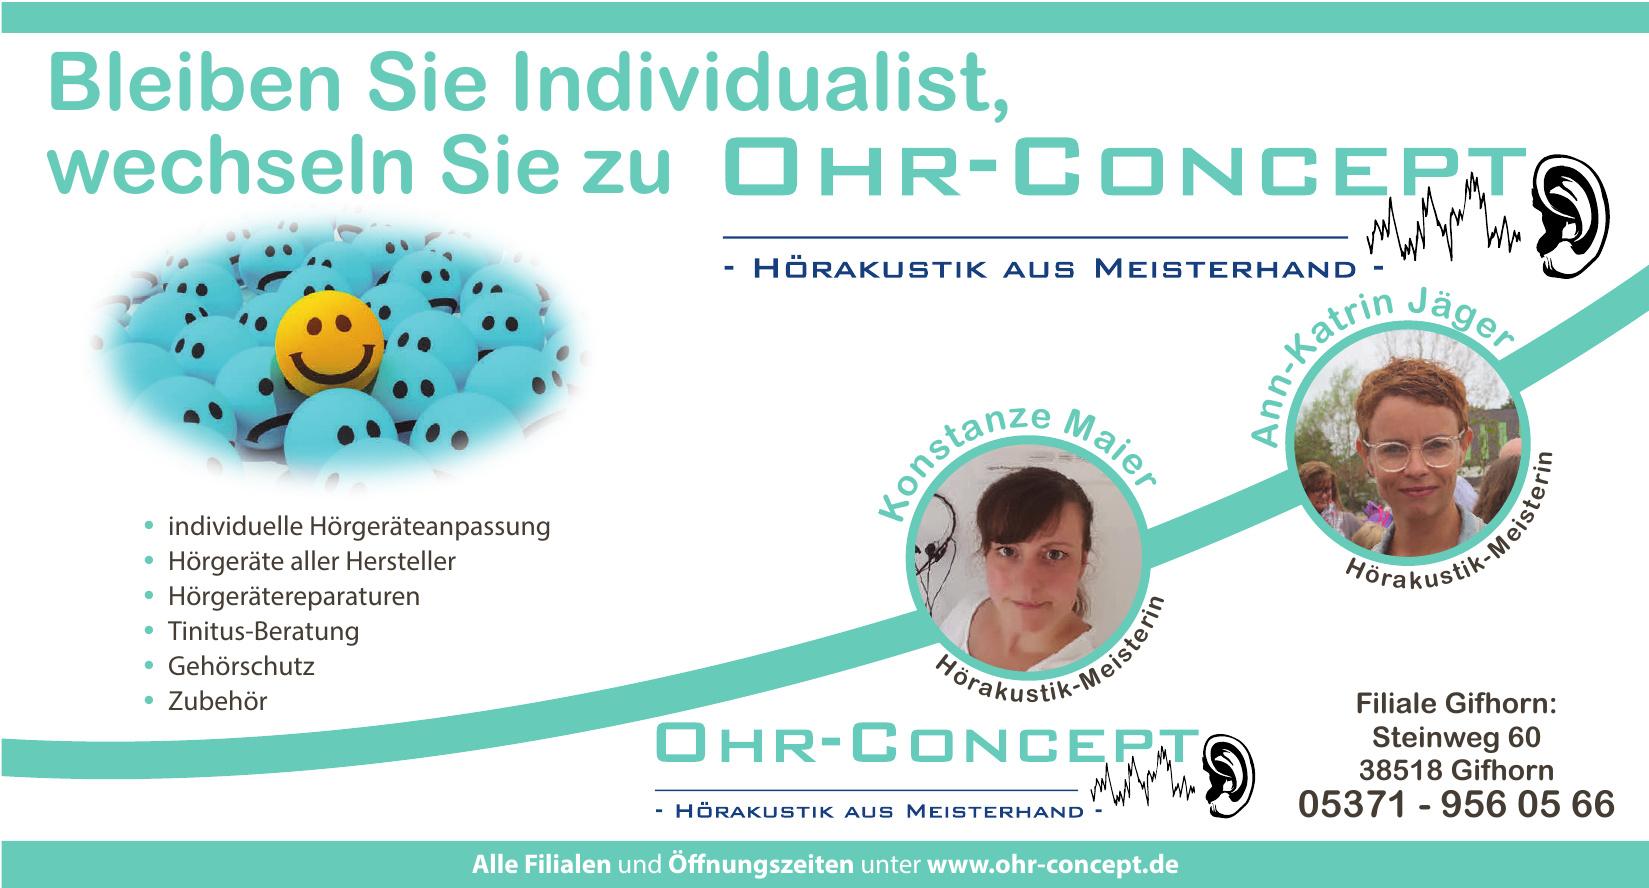 Ohr-Concept